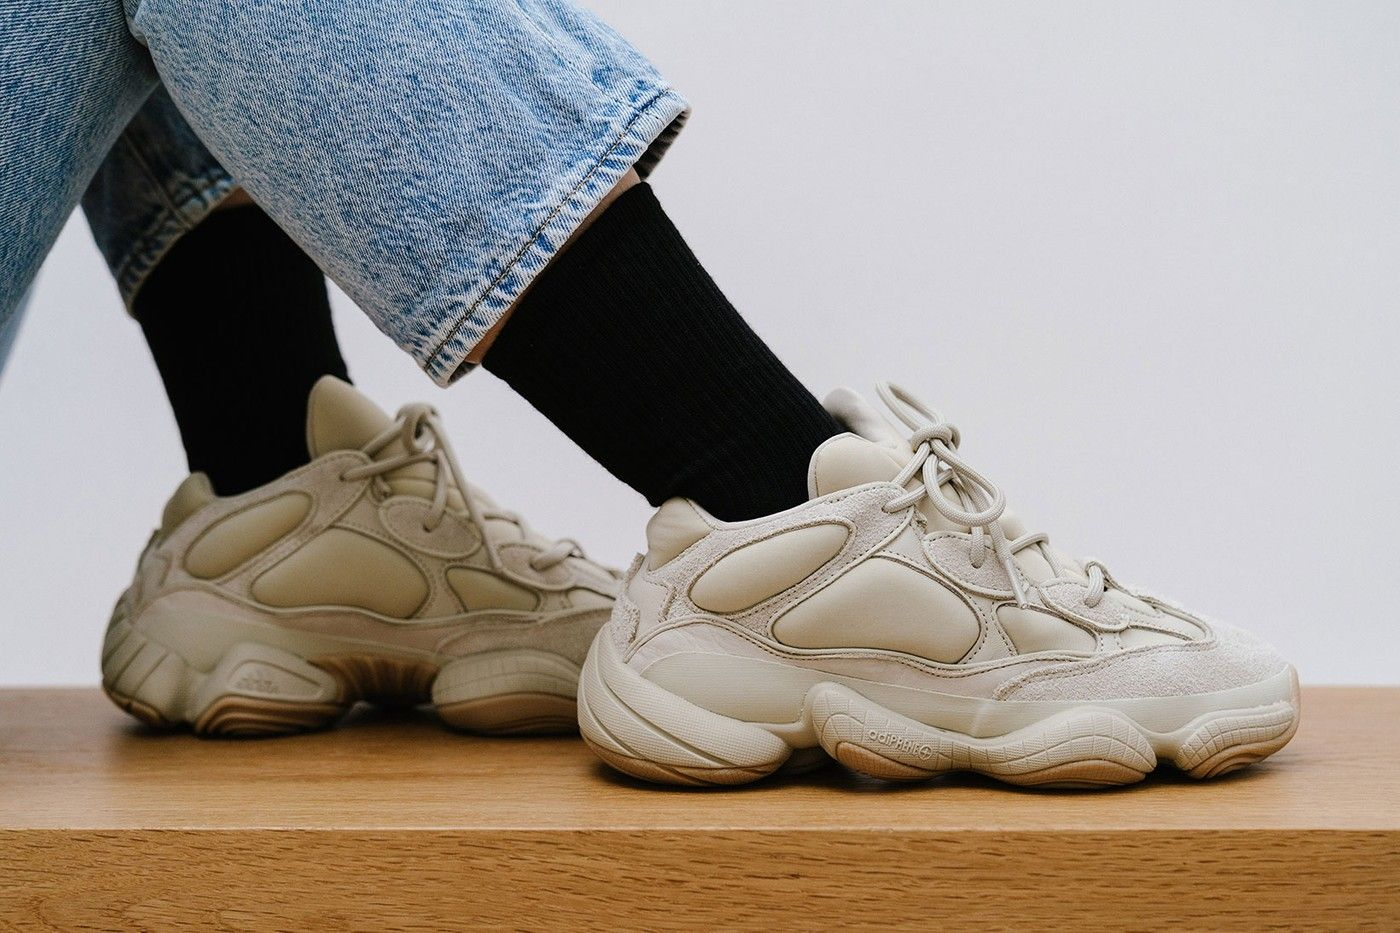 Celebrating Terry Fox Nike Fashion Shoes Fashion Shoes Sneakers Yeezy